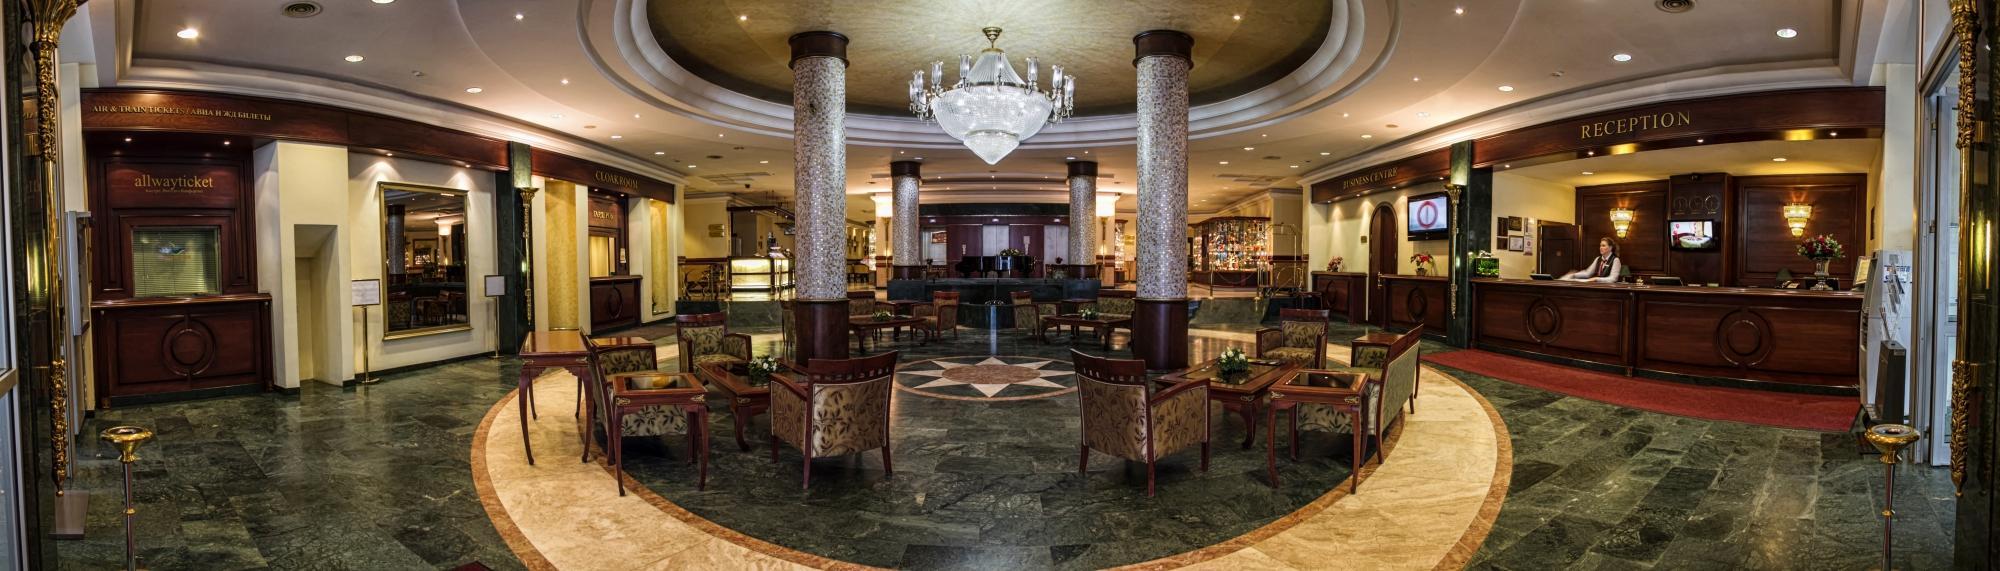 Ring Premier Hotel